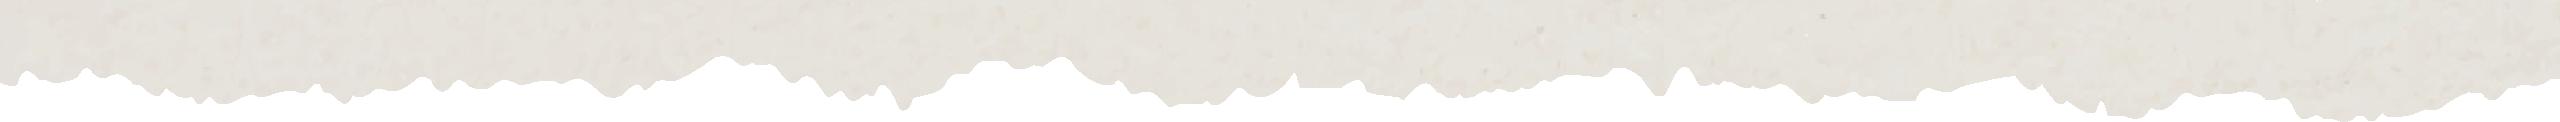 Bottom Parchment Background